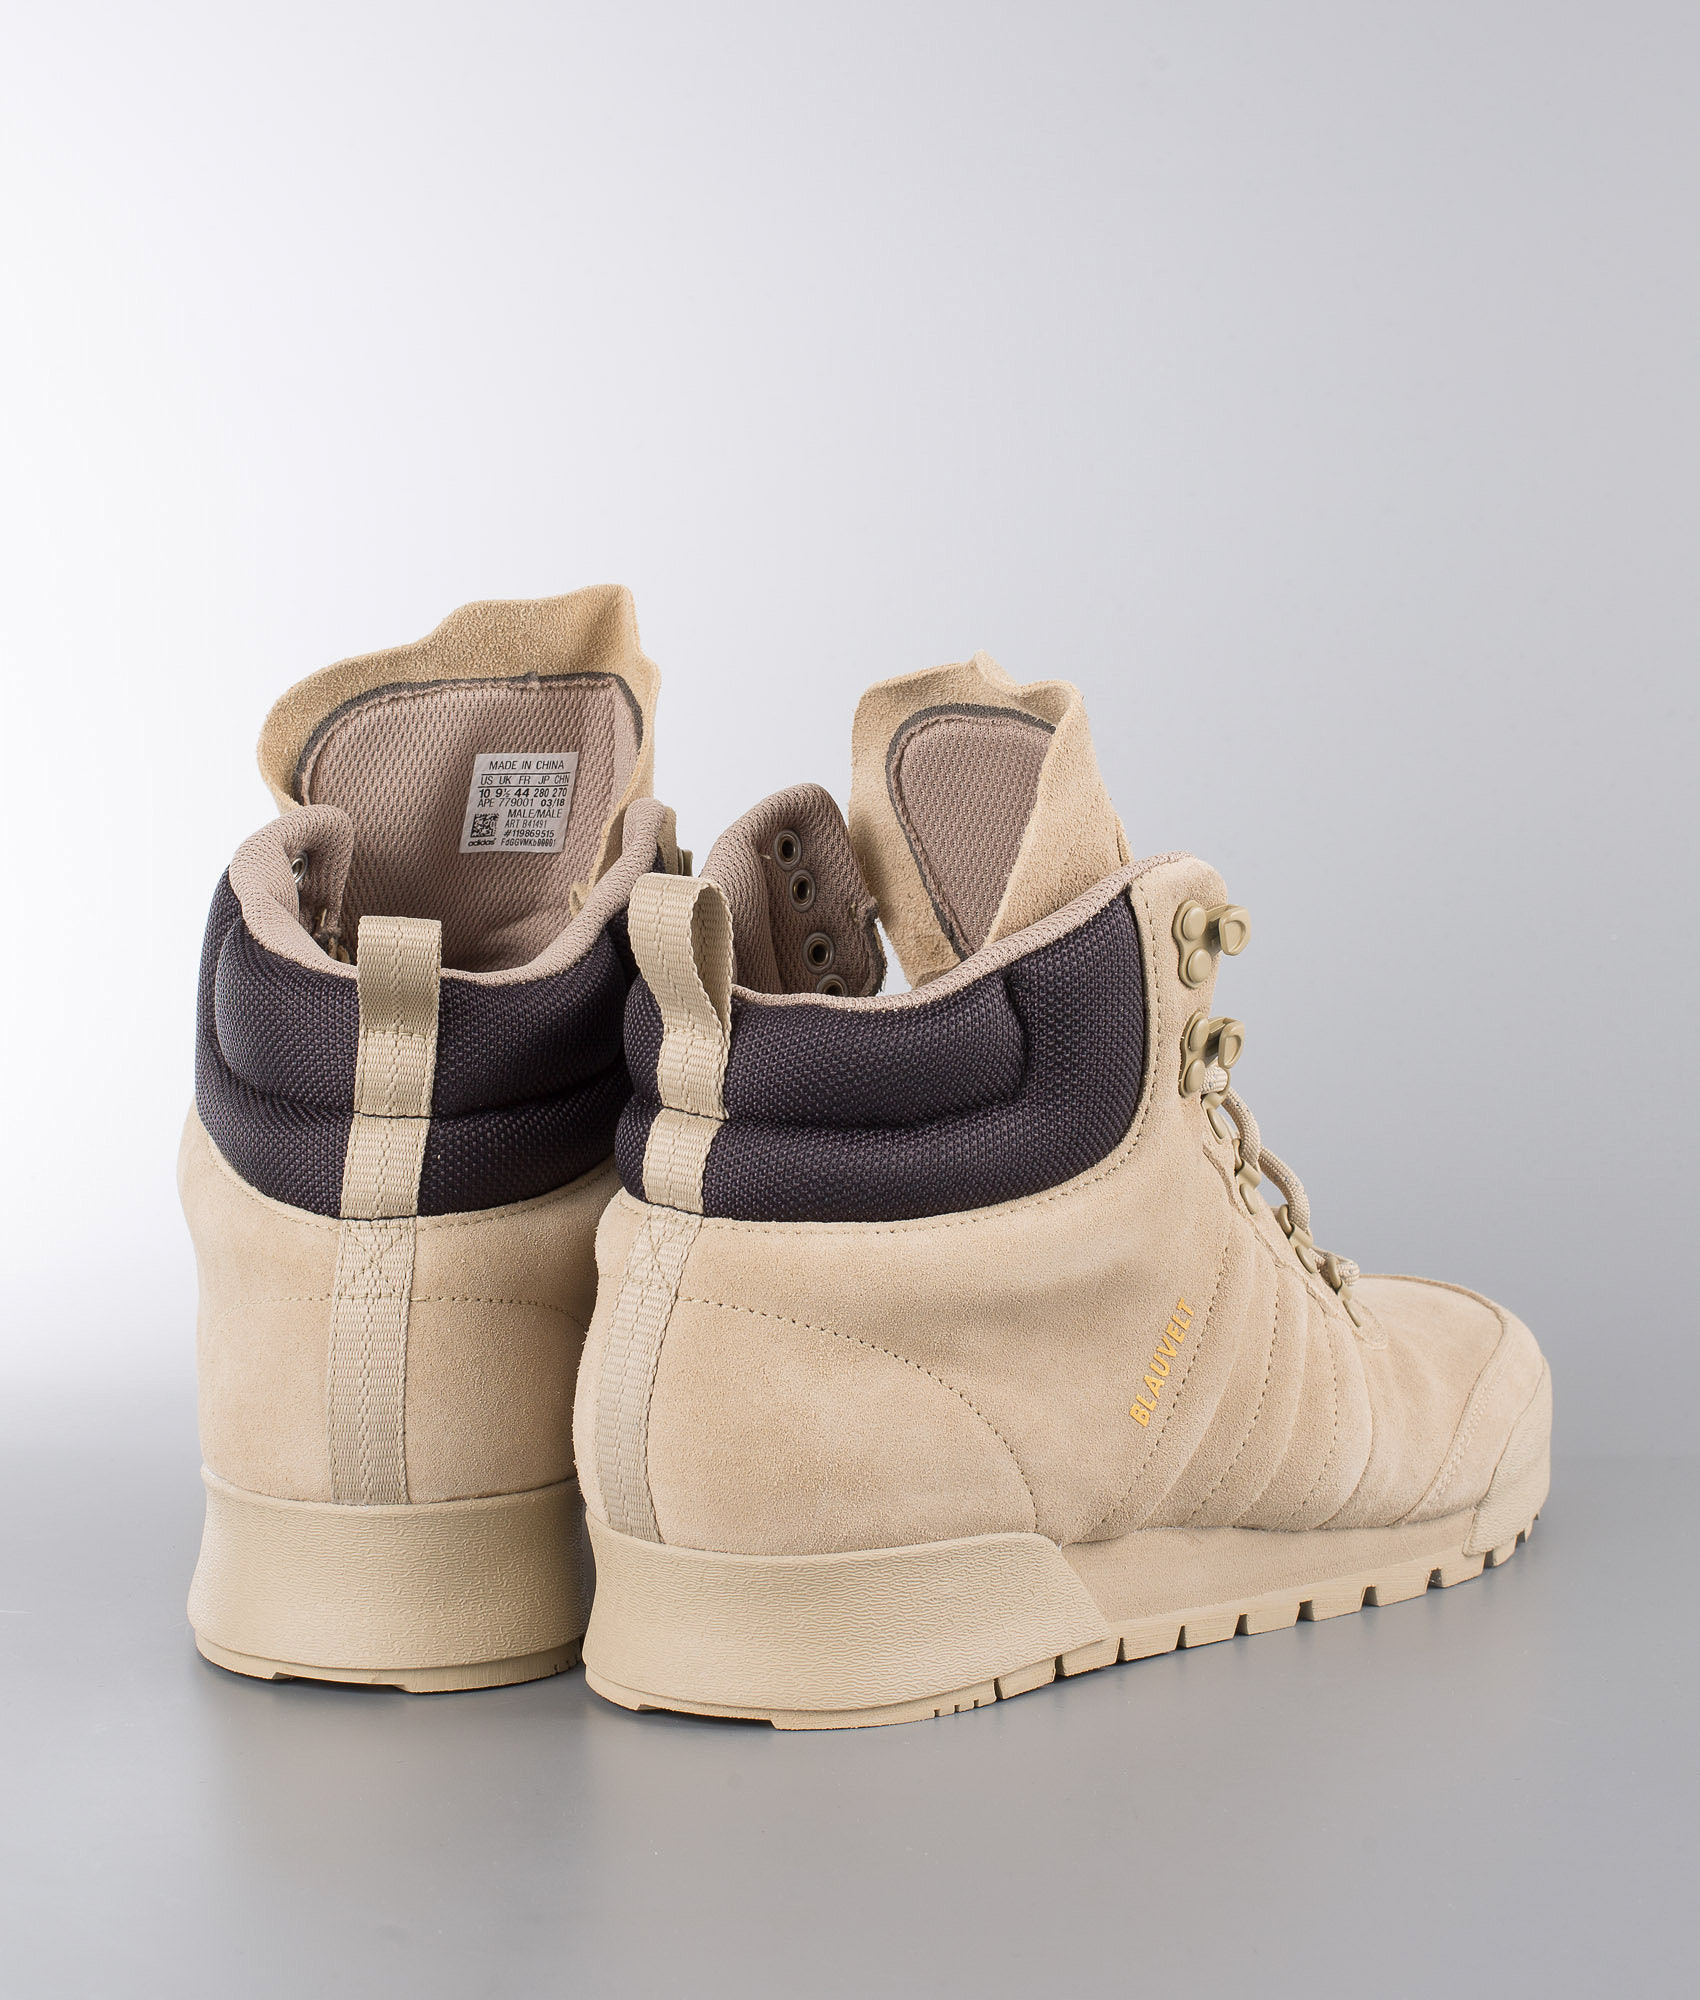 6c96545de04 Adidas Skateboarding Jake Boot 2.0 Shoes Raw Gold/Core Black/Goldmt